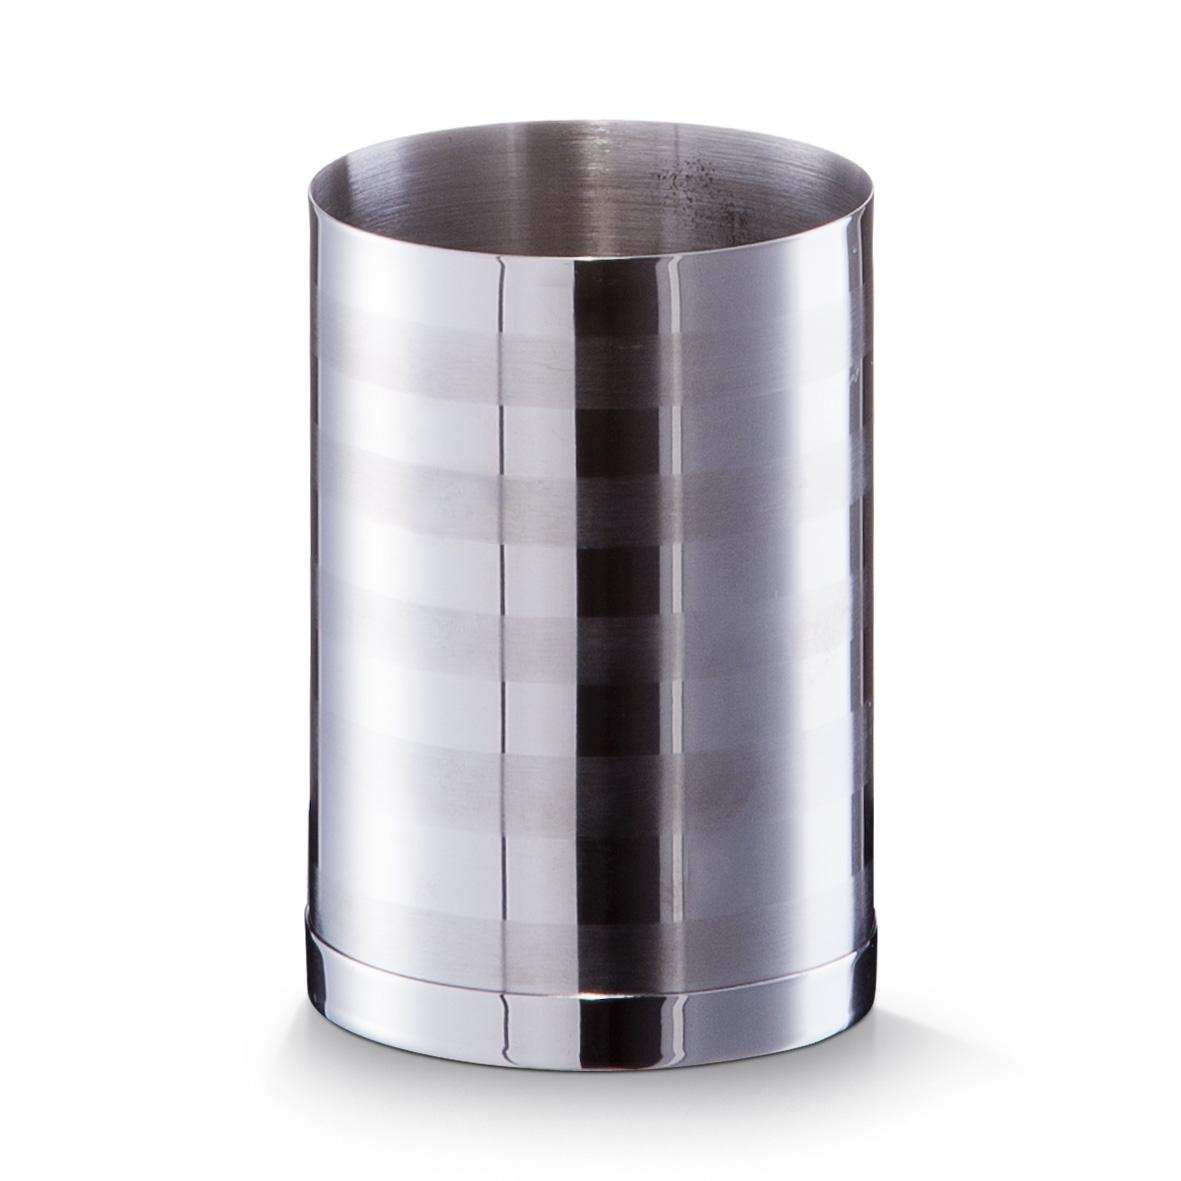 Pahar pentru periuta din otel inoxidabil, Ø 7xH10 cm imagine